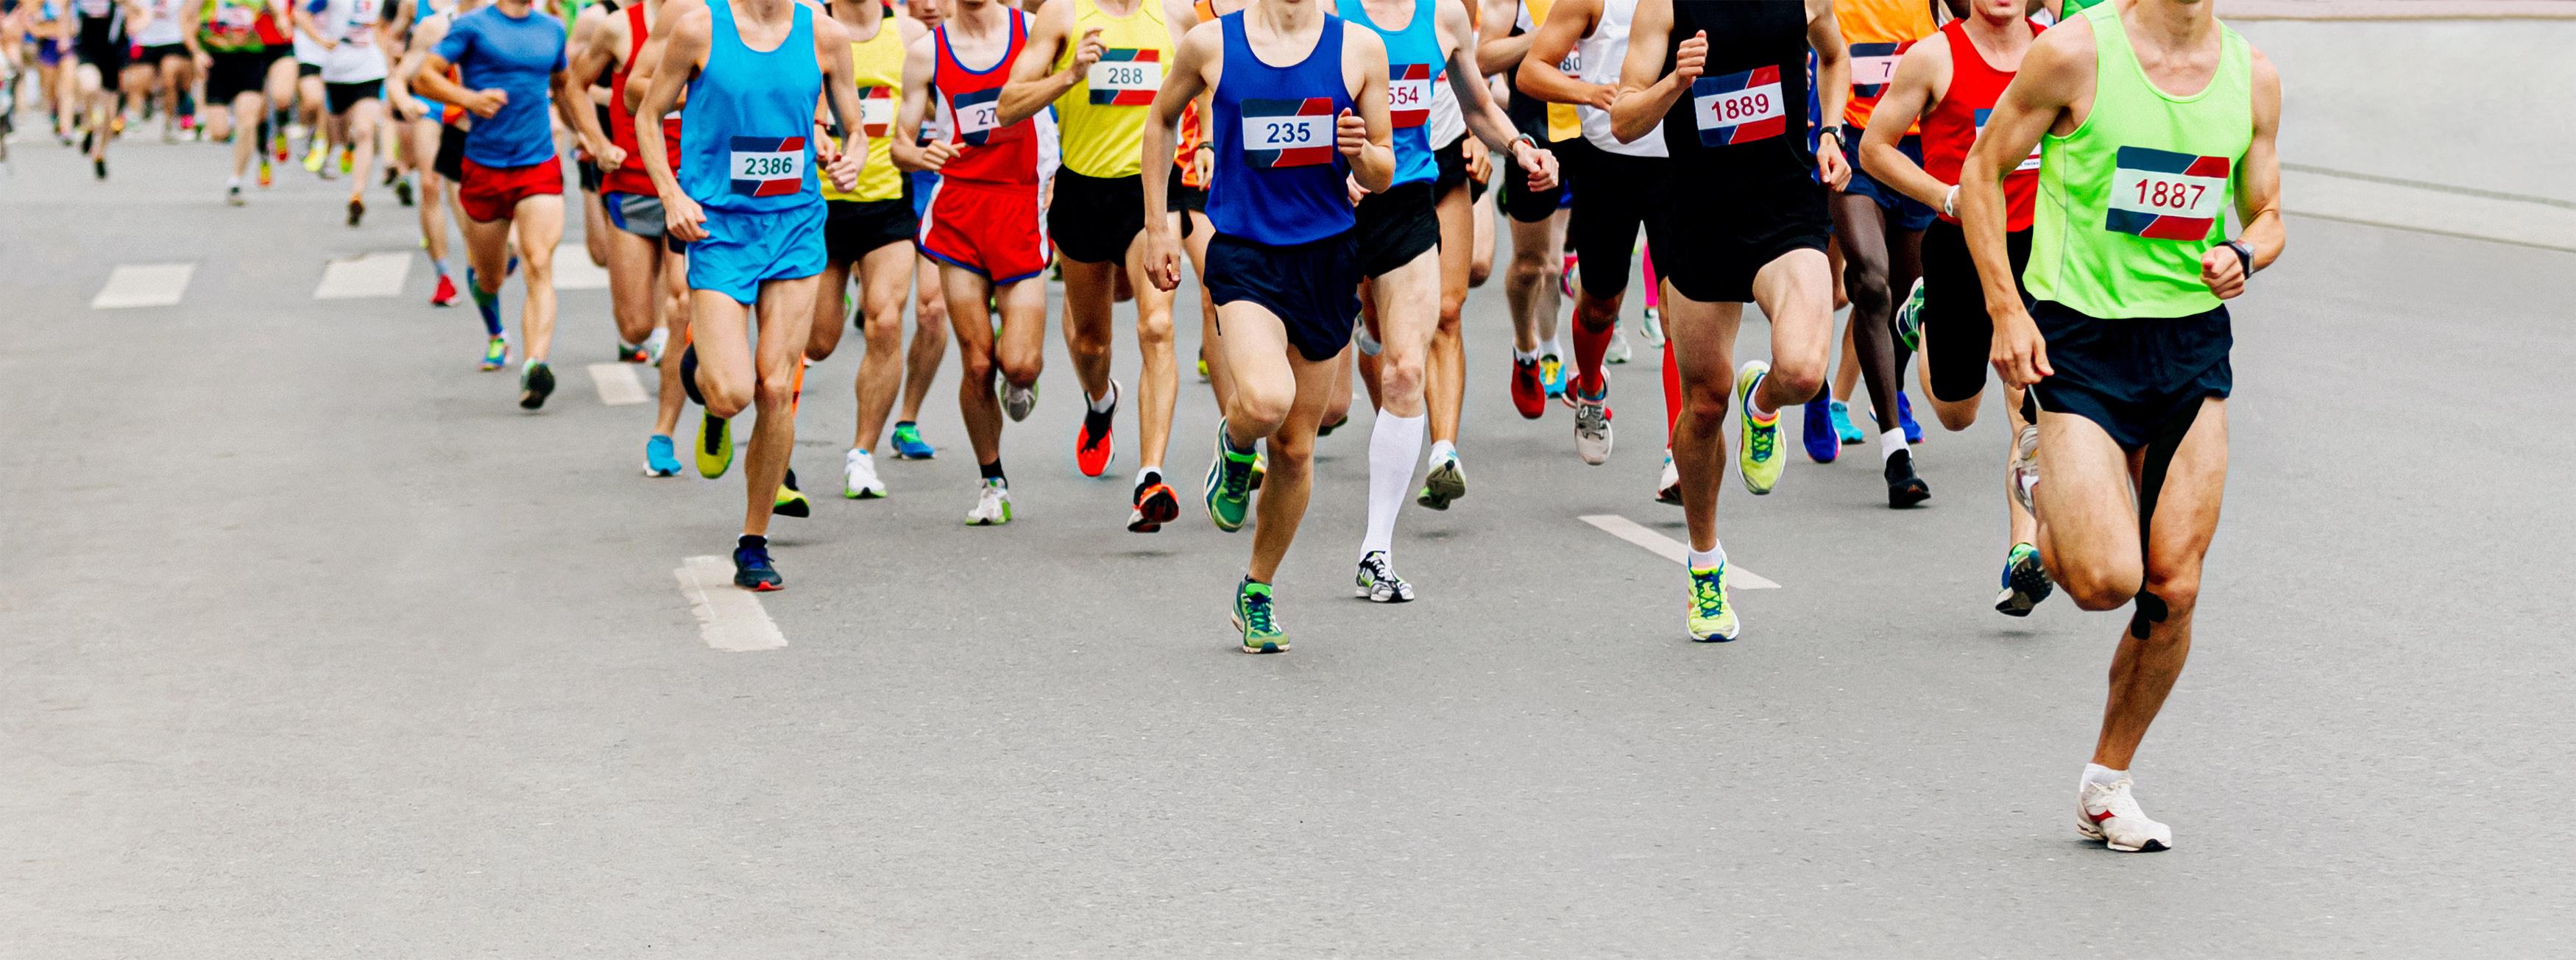 Image for Lessons Learned: Boston Marathon Bombing & COVID-19 Facilities Protocols